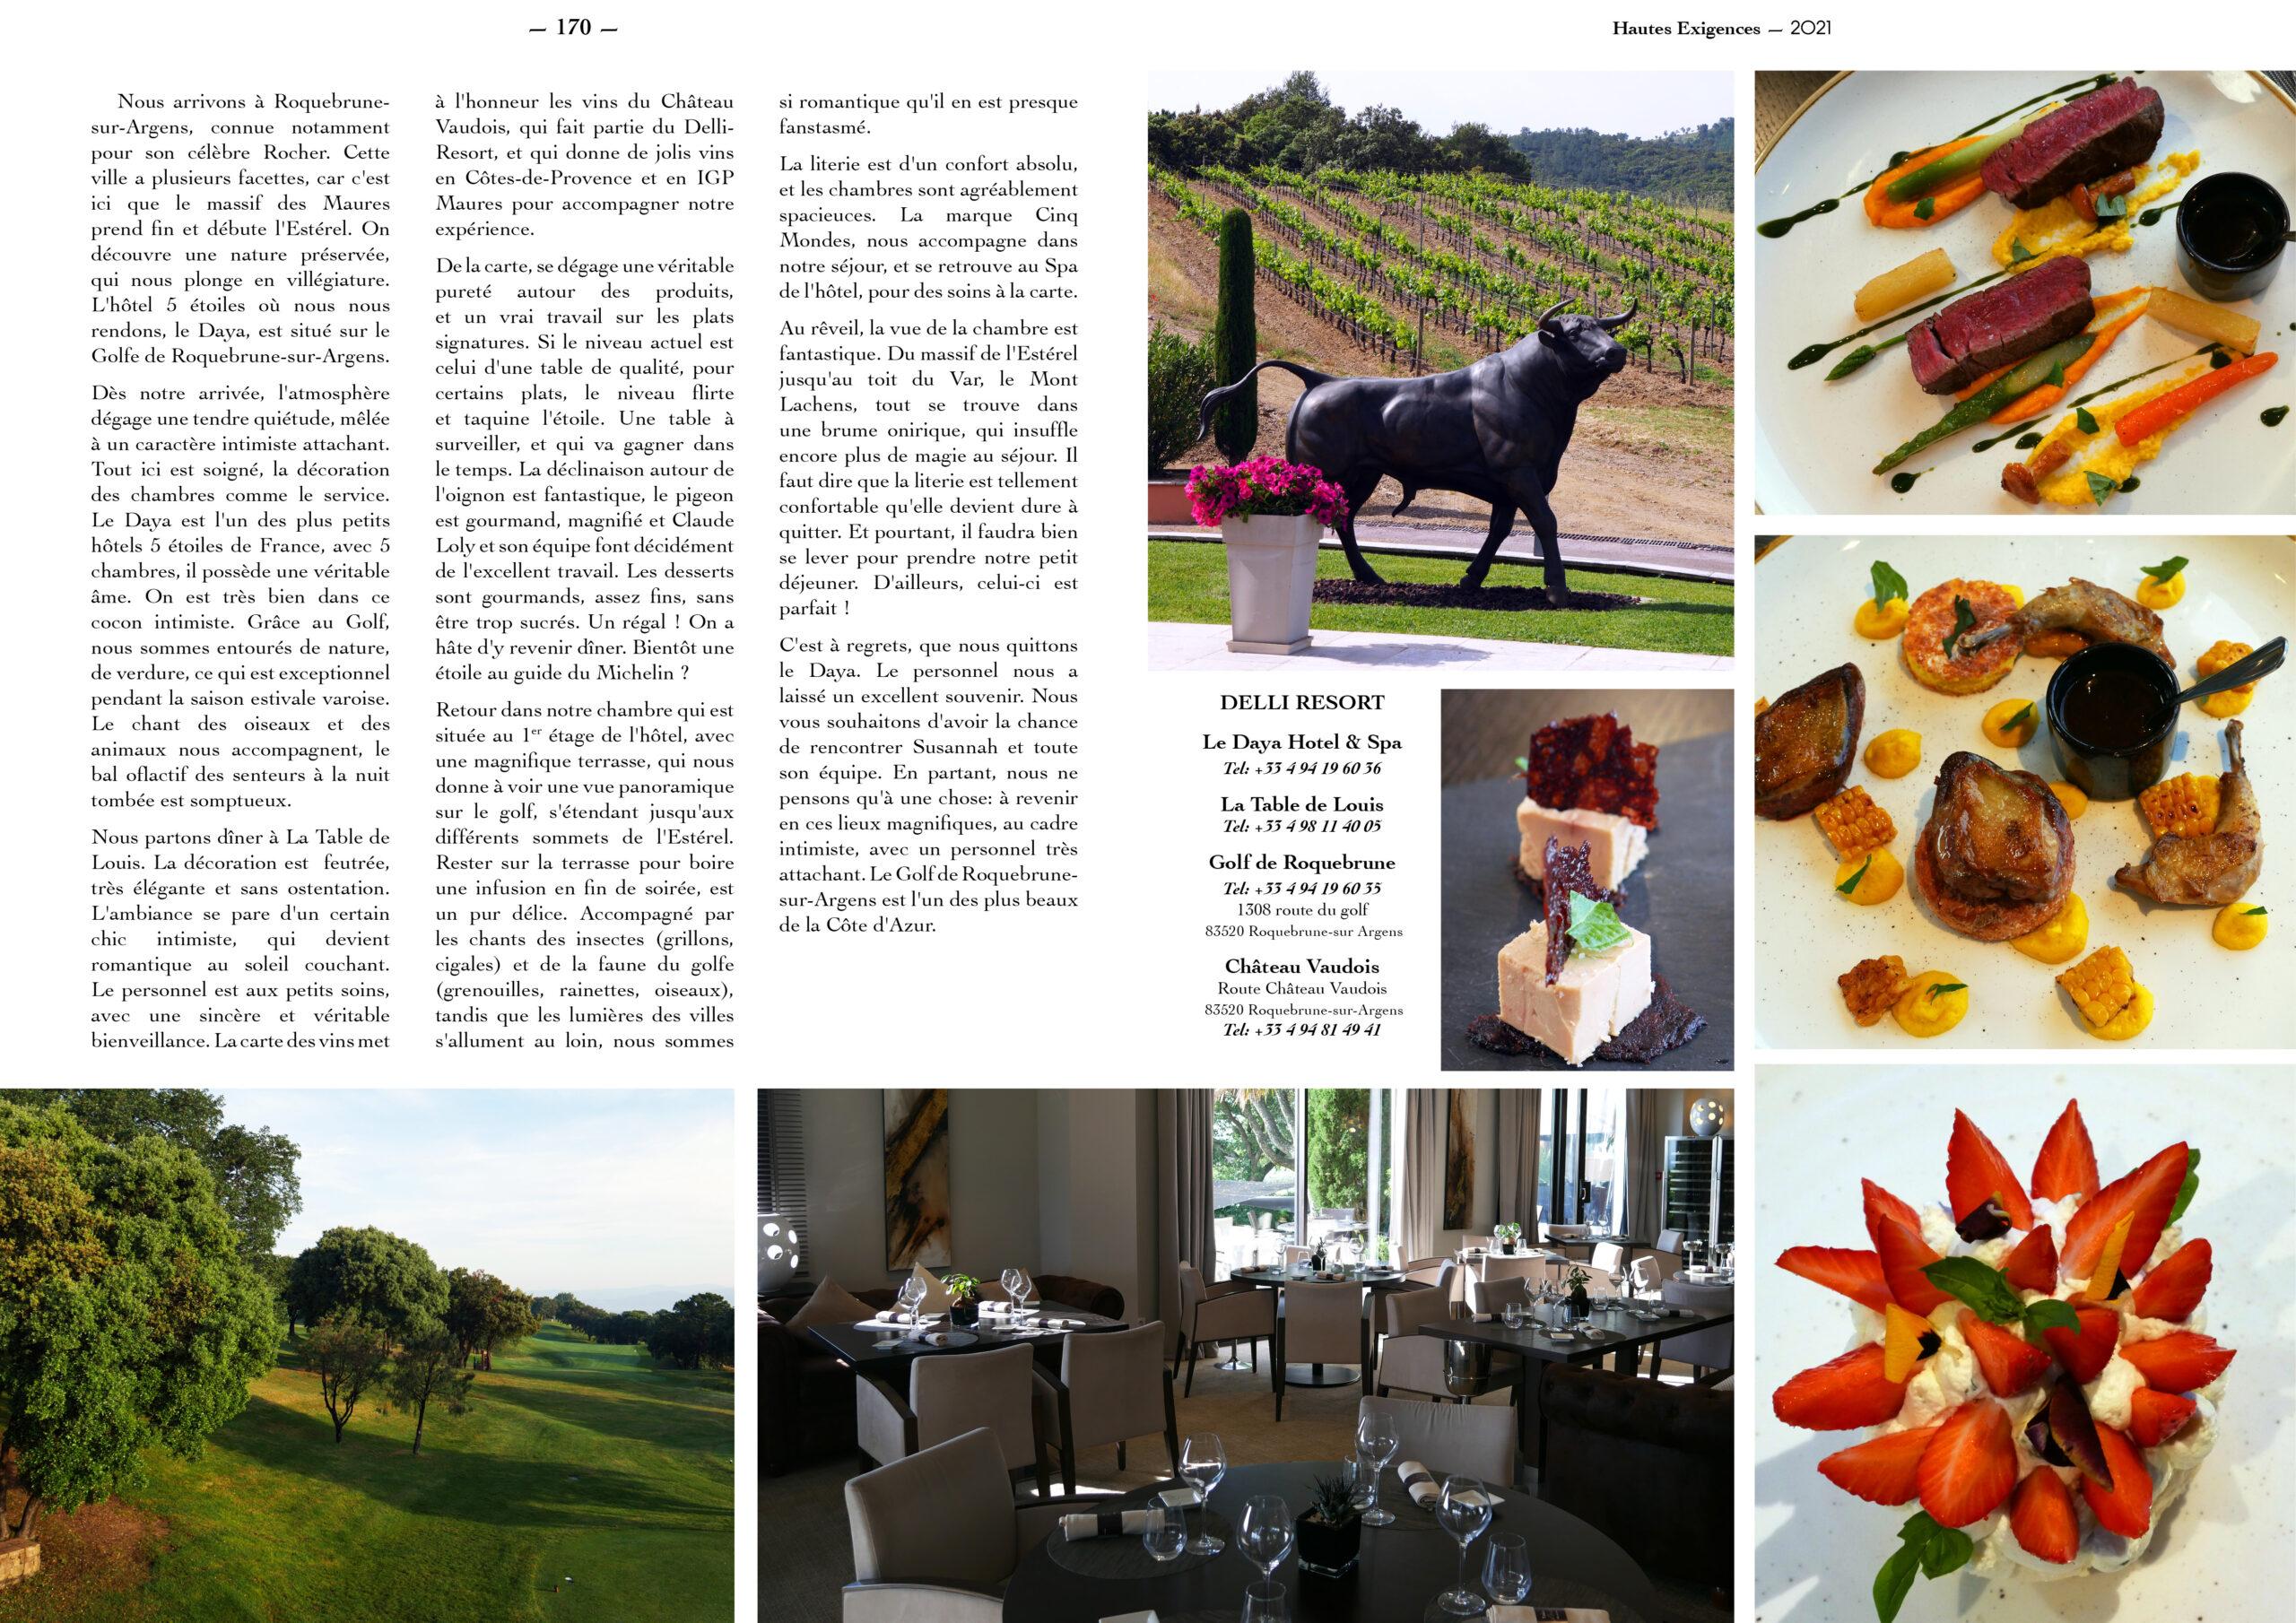 Hautes Exigences Magazine Hors Serie 2021 page 168-169